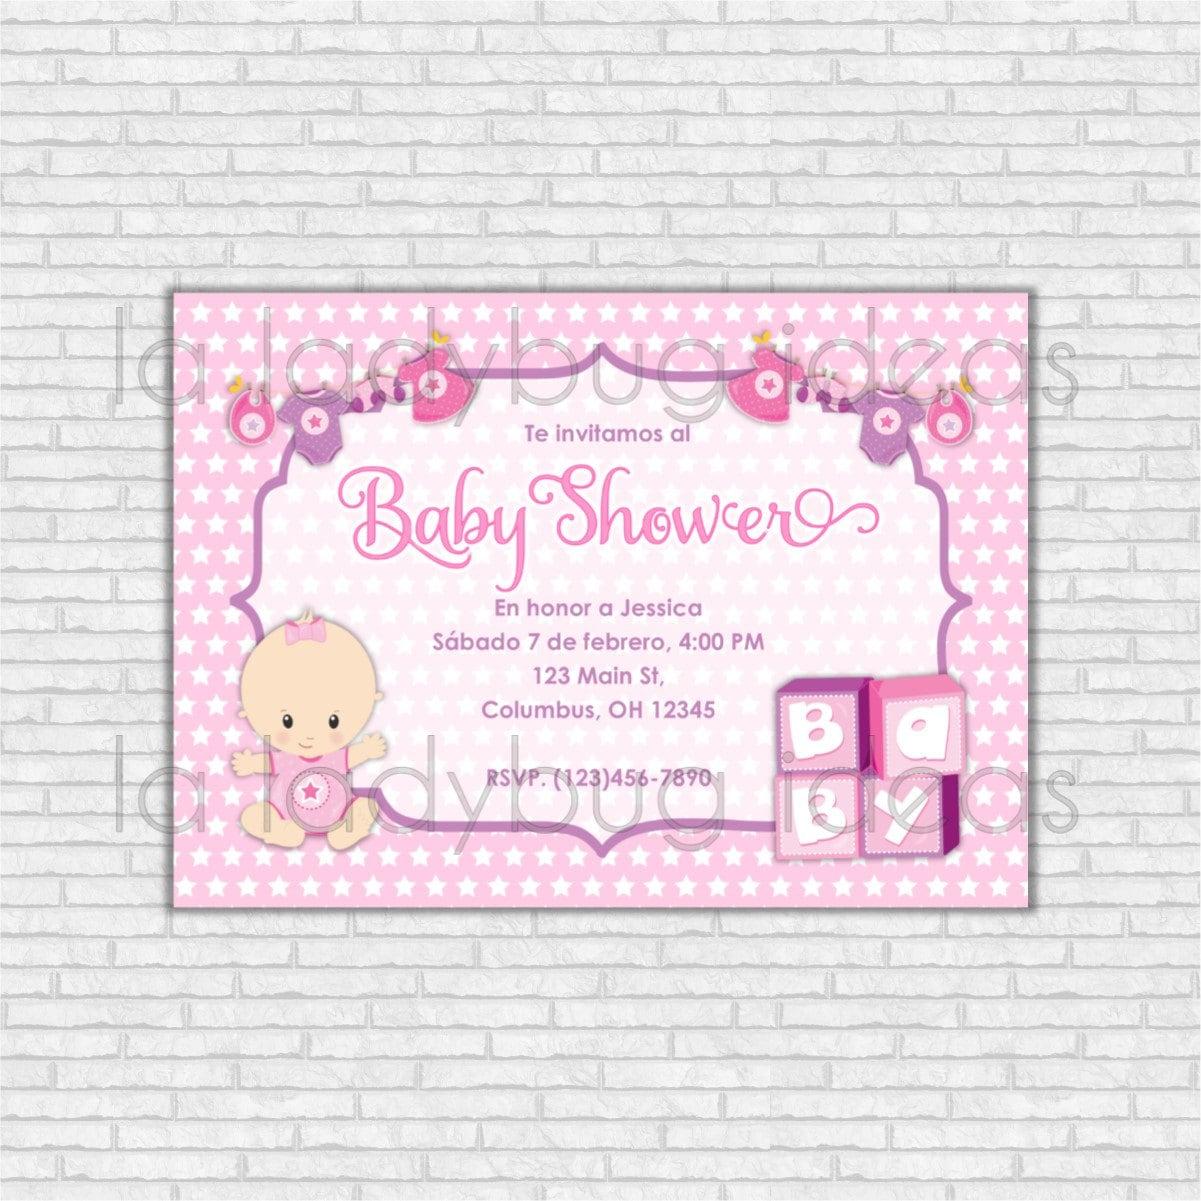 Invitaci n digital baby shower para ni a rosa imprimible - Baby shower de nina ...